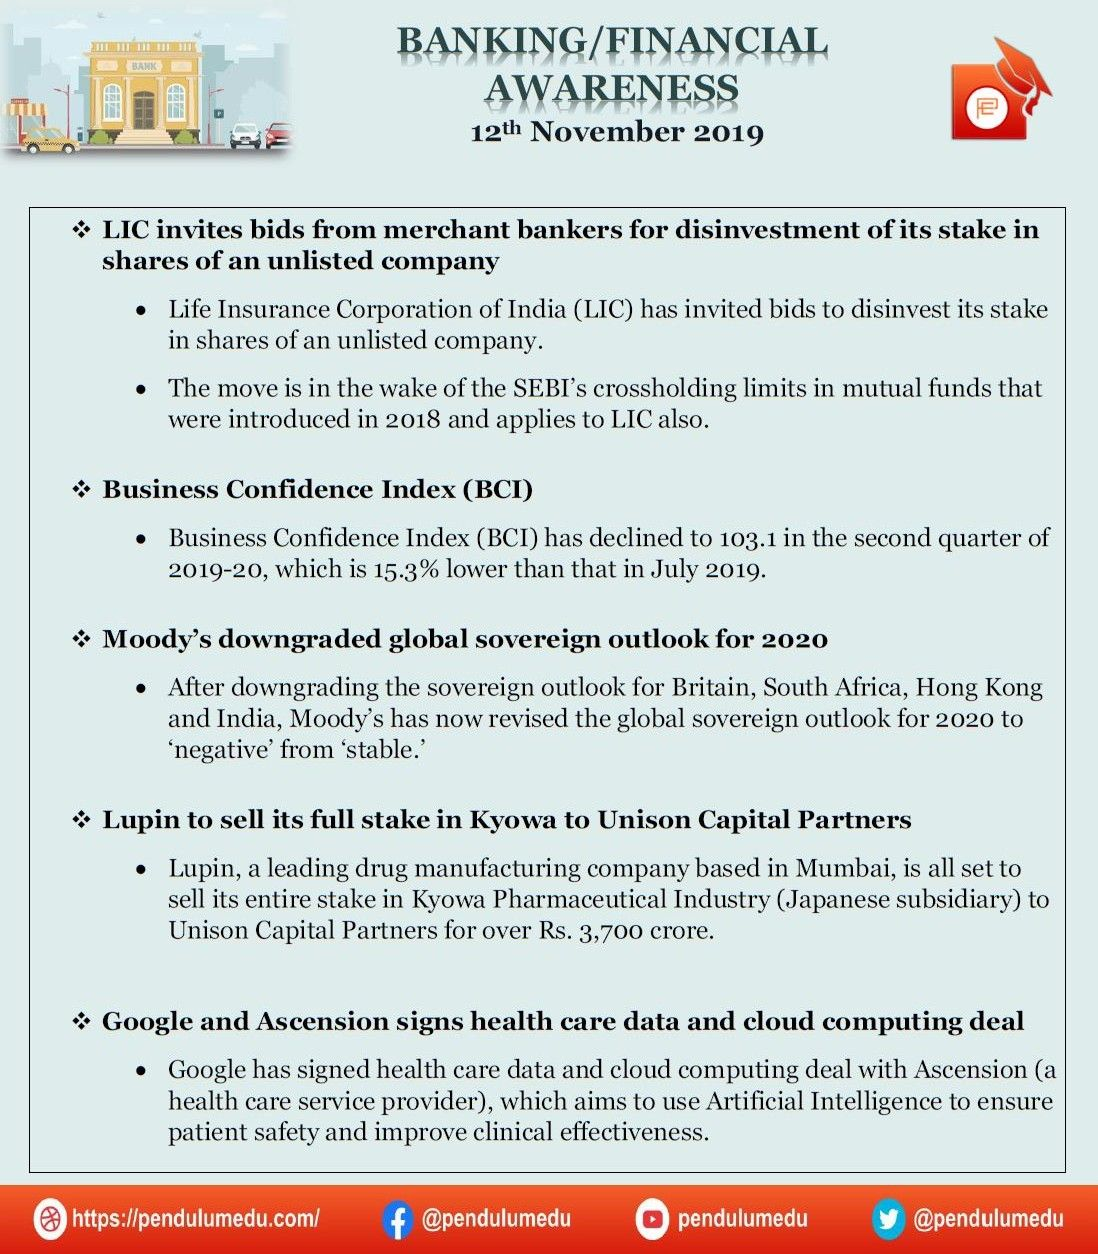 Economic Banking And Financial Awareness Life Insurance